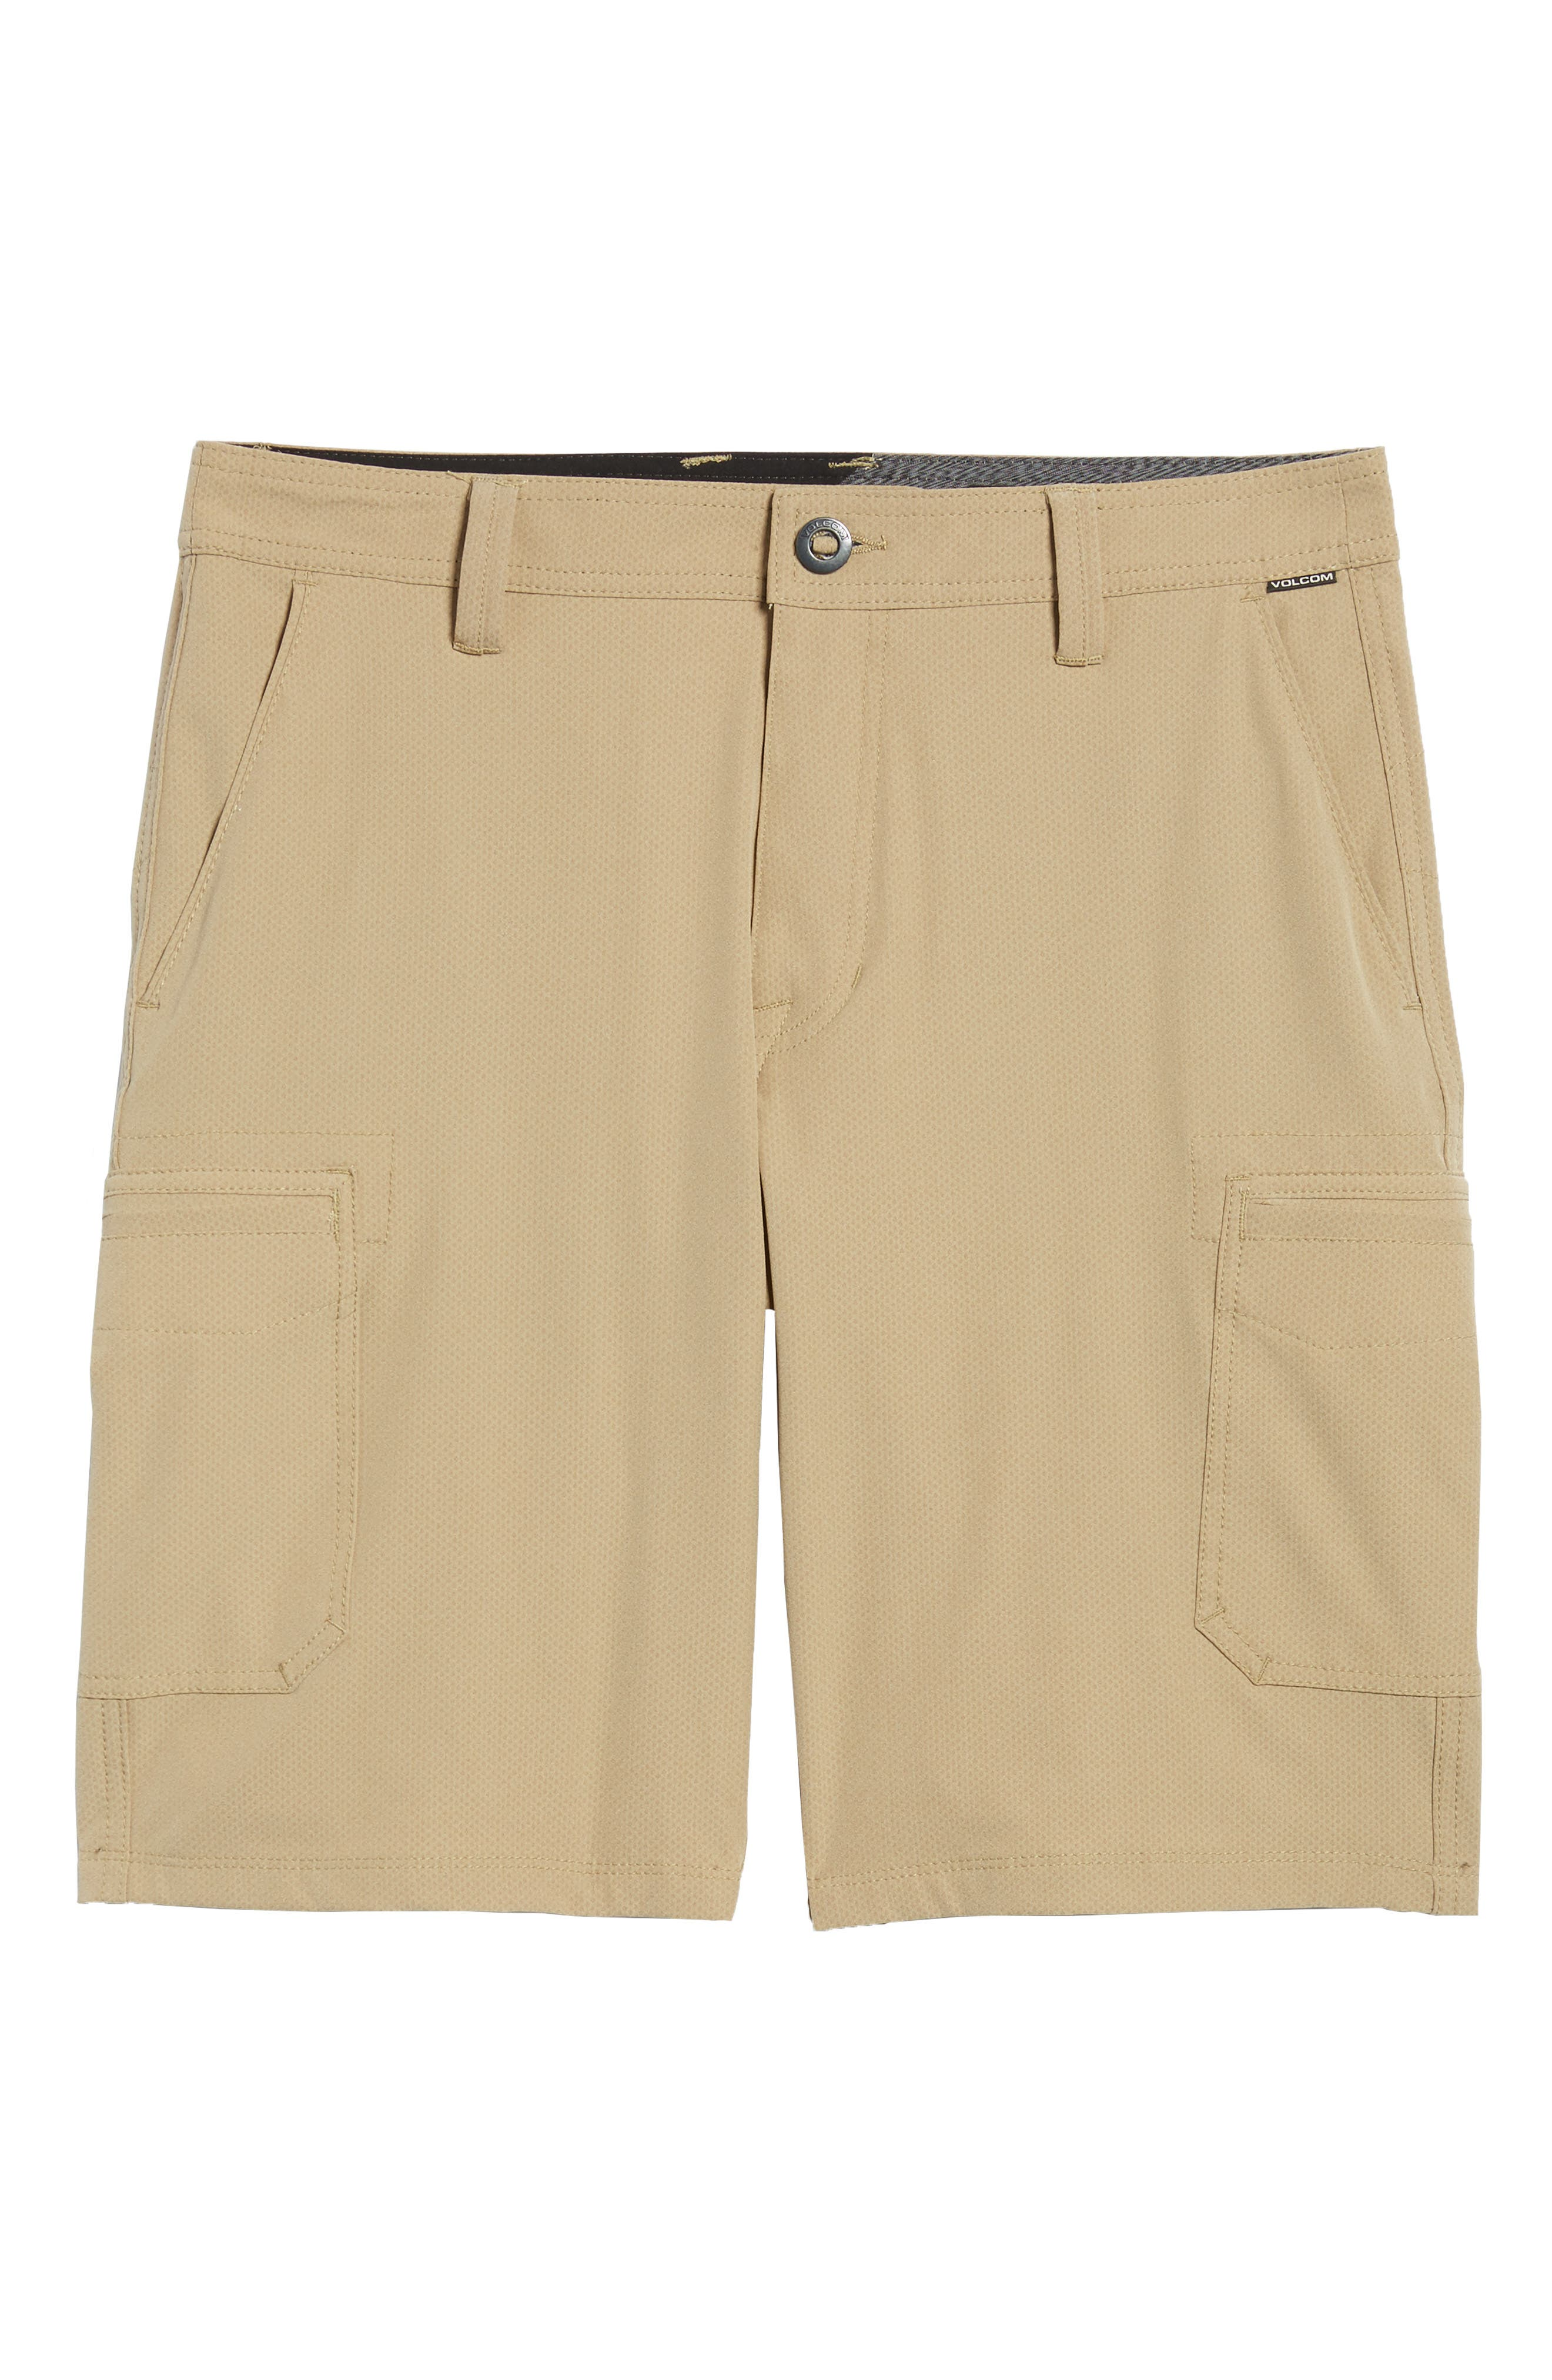 Surf N' Turf Dry Cargo Hybrid Shorts,                             Alternate thumbnail 6, color,                             KHAKI